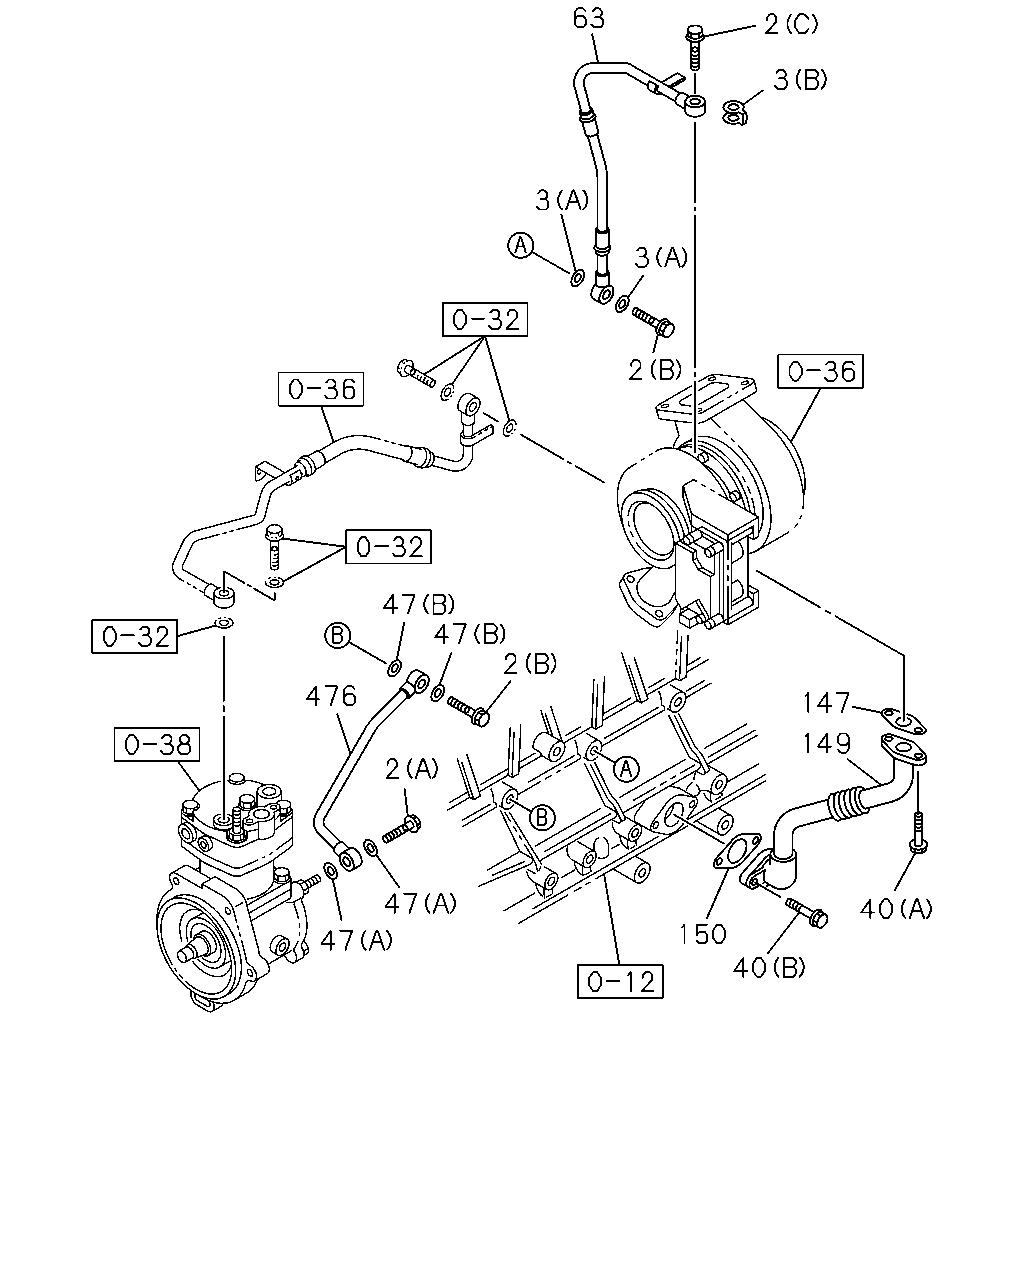 F&G, 11716 - FTR AUST/NZ EURO5 16 - , 0 - Engine, Emission ... on 2.0l engine diagram, inline 4 cylinder engine diagram, 5.3l engine diagram,